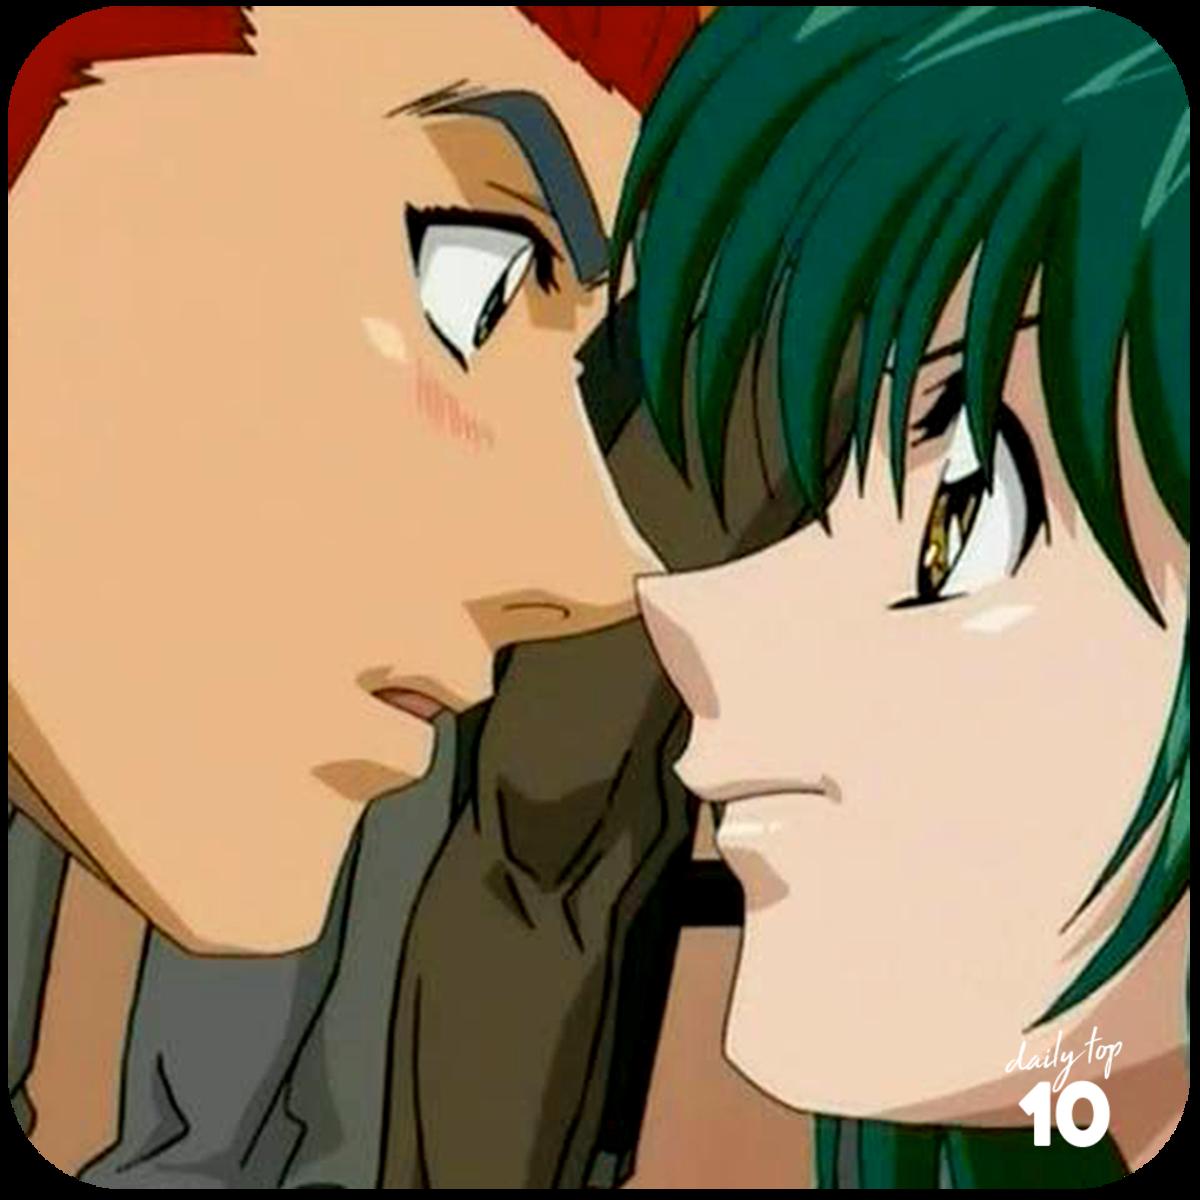 Kanou and Miki arguing